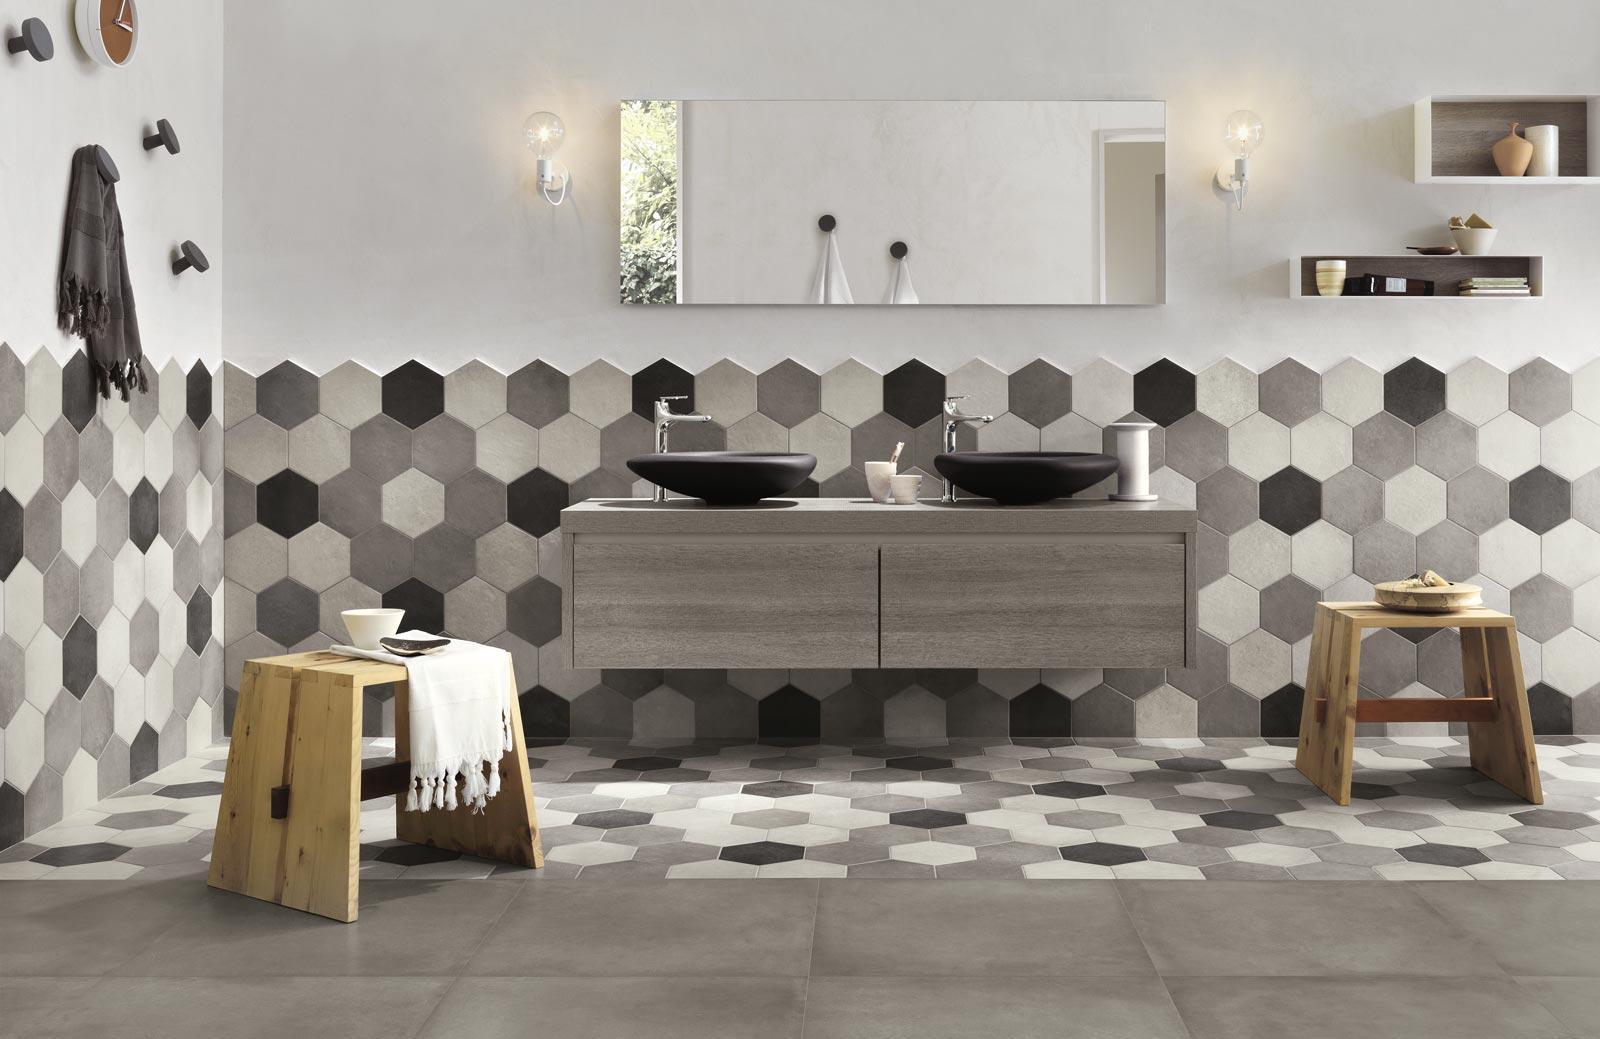 Gres Porcellanato Piastrelle Cucina rewind collection: concrete effect porcelain stoneware | ragno